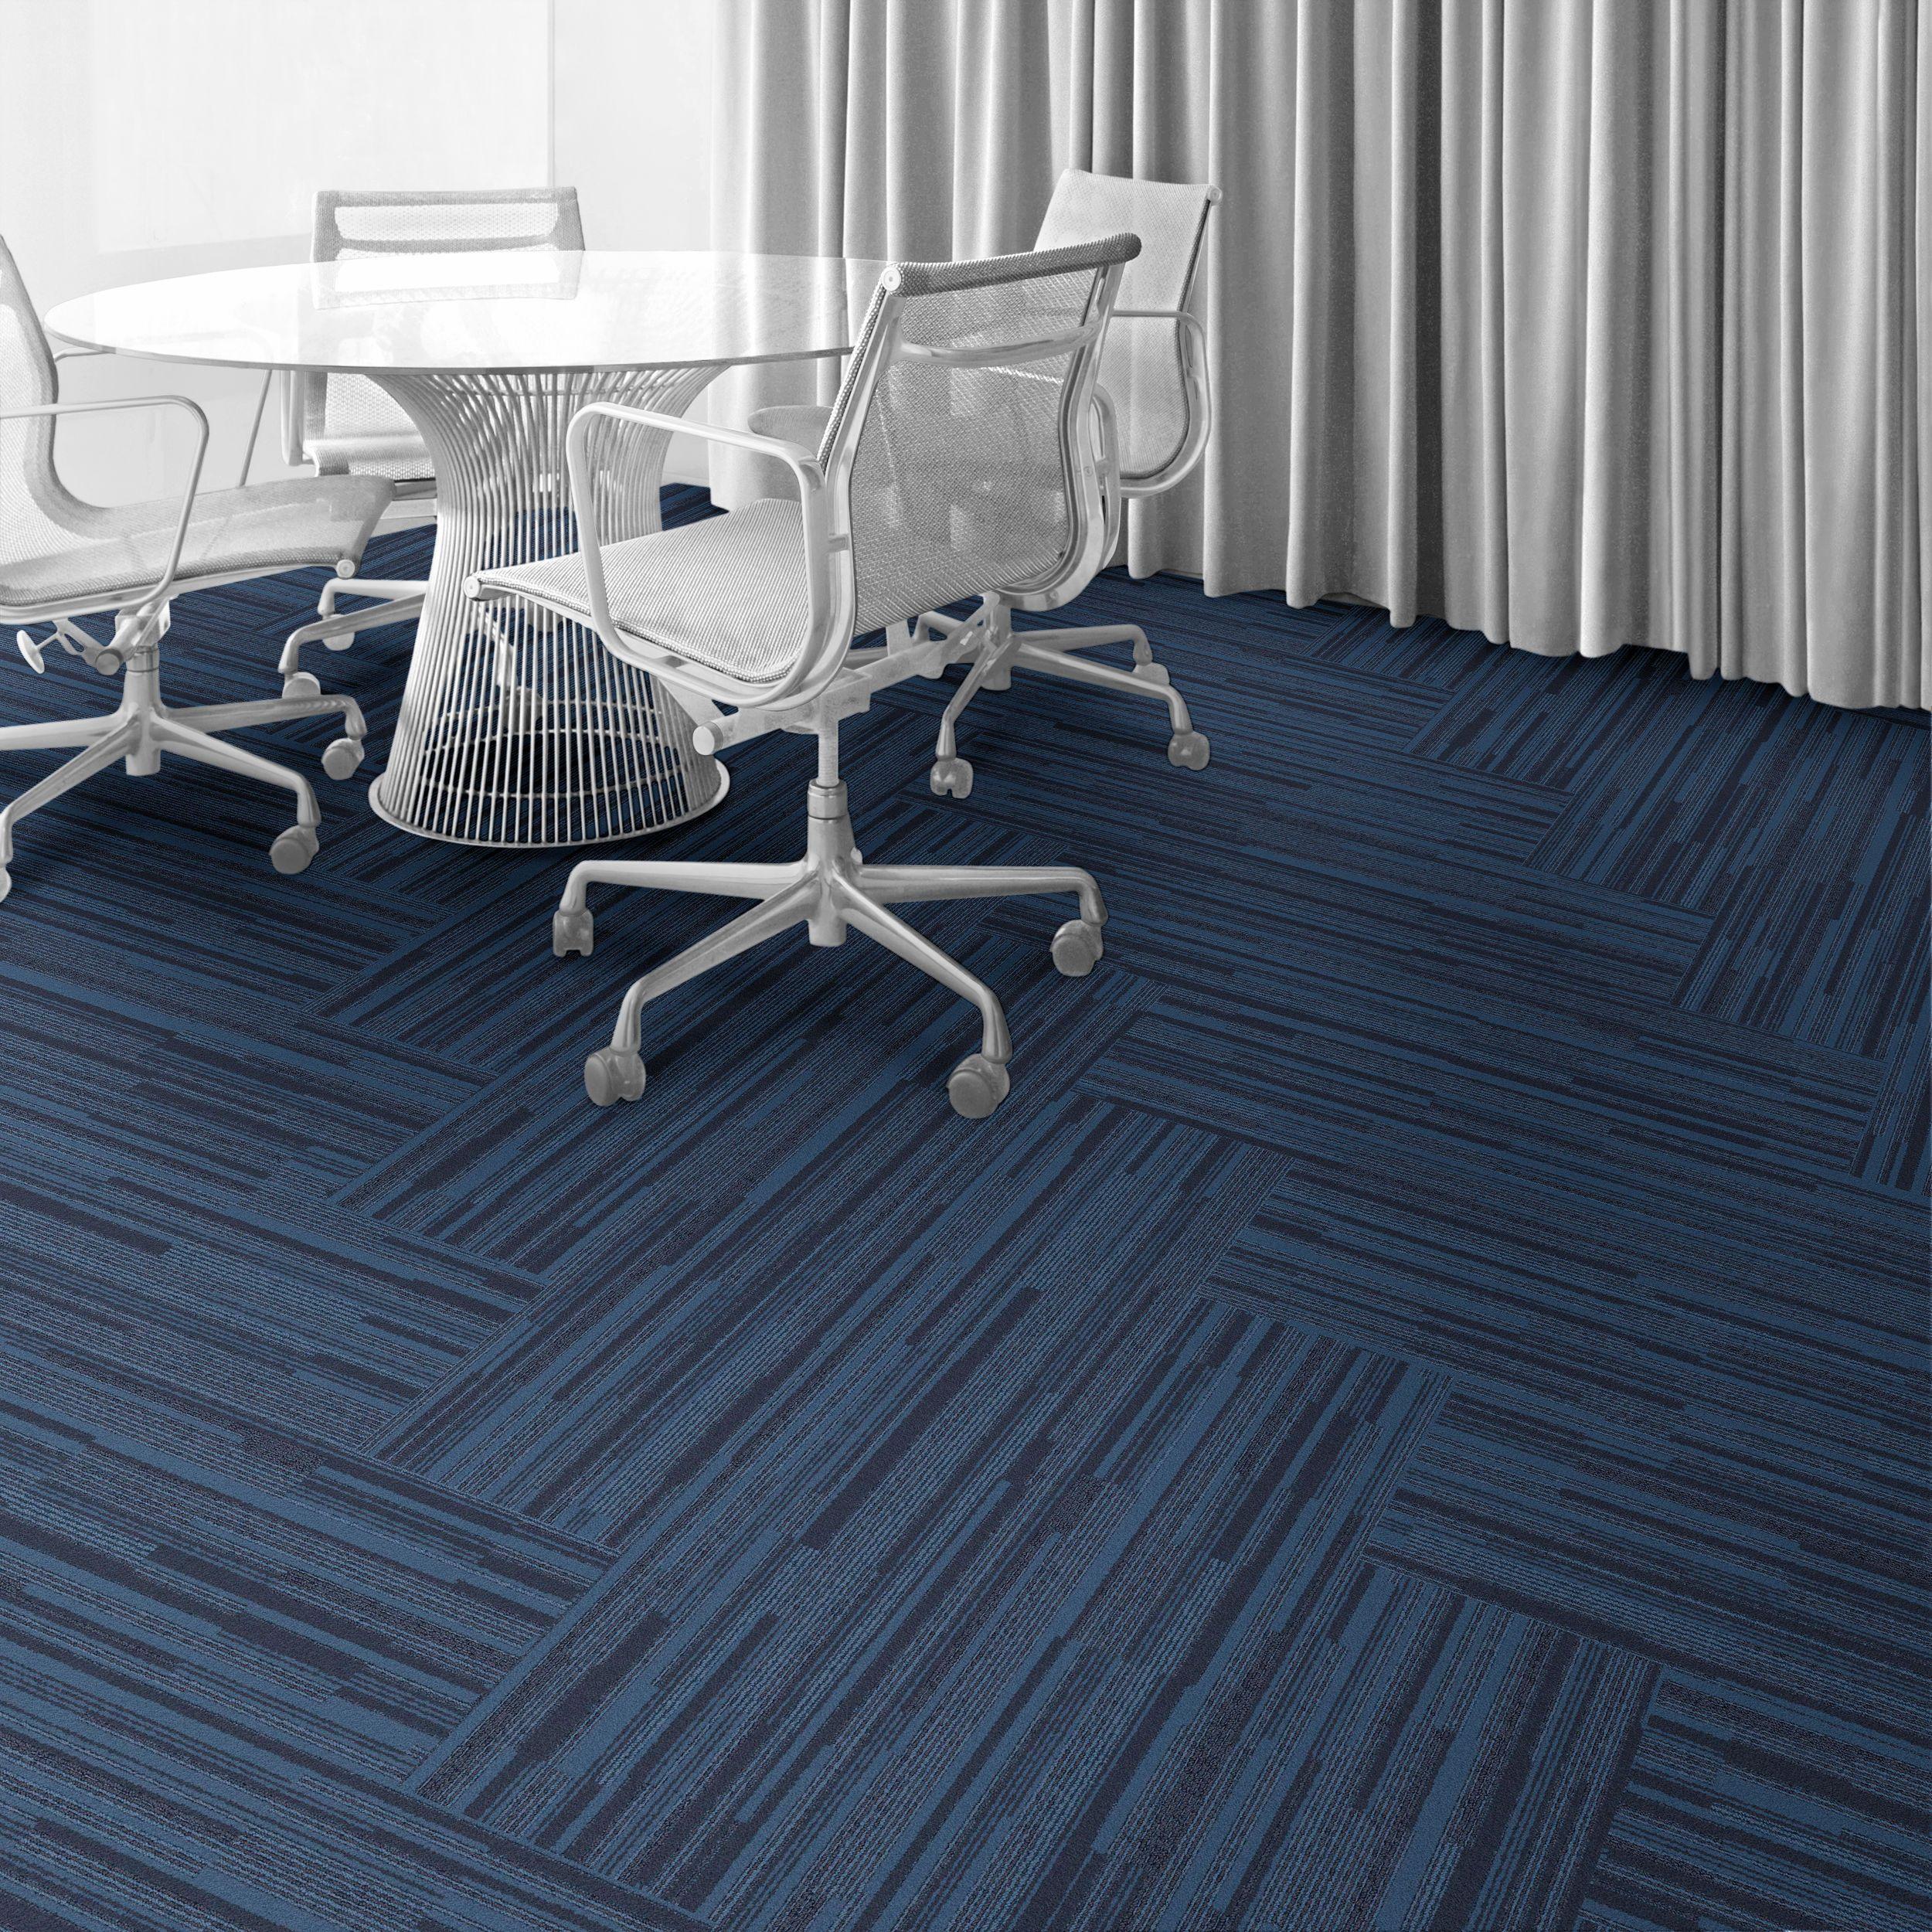 Interface Carpet Tile B701 Color North Sea 7431 002 000 Installation Method Herringbone Floor Design Modular Carpet Tiles Commercial Carpet Tiles